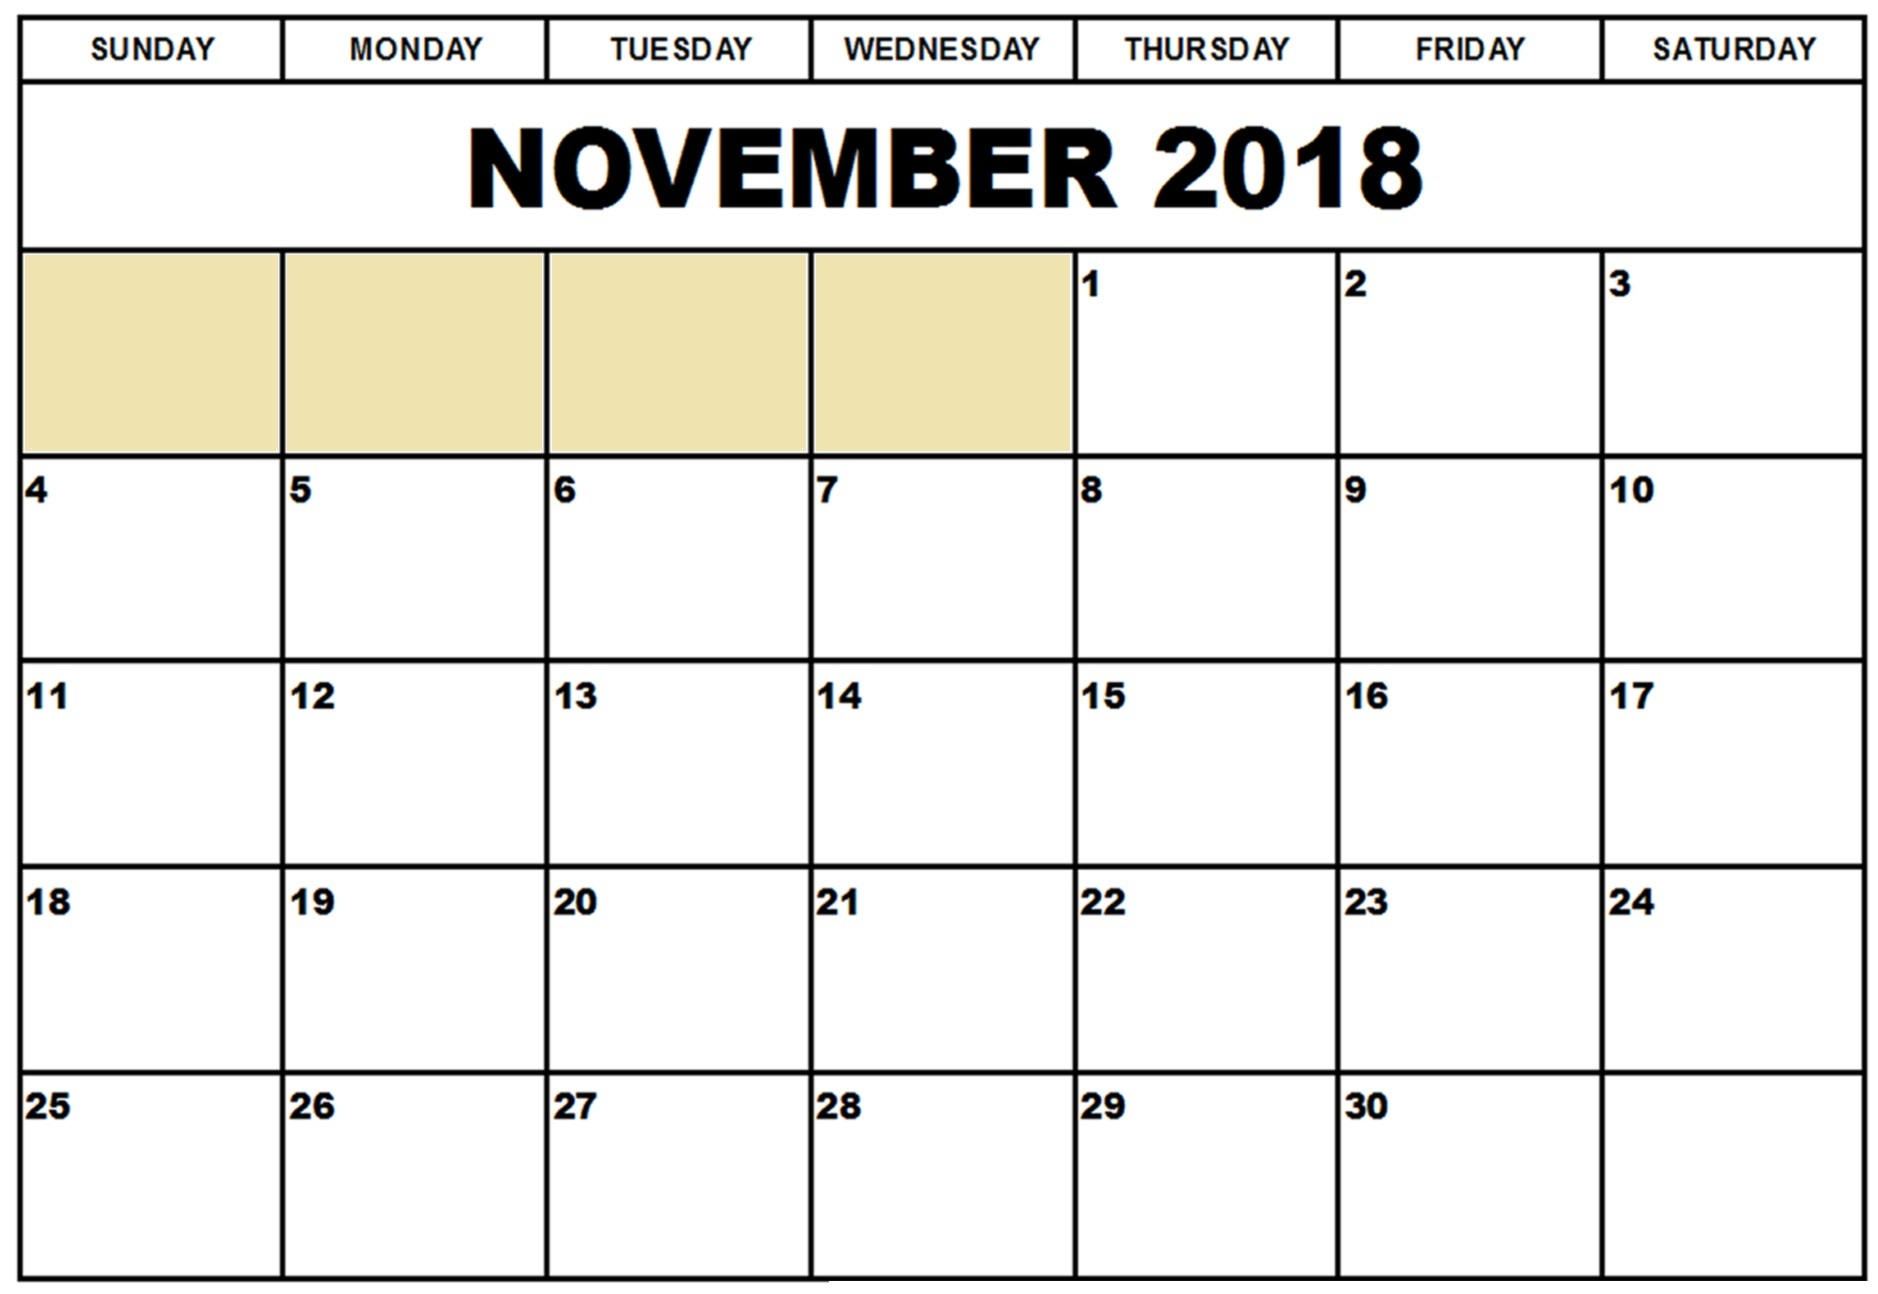 Blank Calendar November 2018 Template Free With Notes pertaining to Blank Calendar For November And December